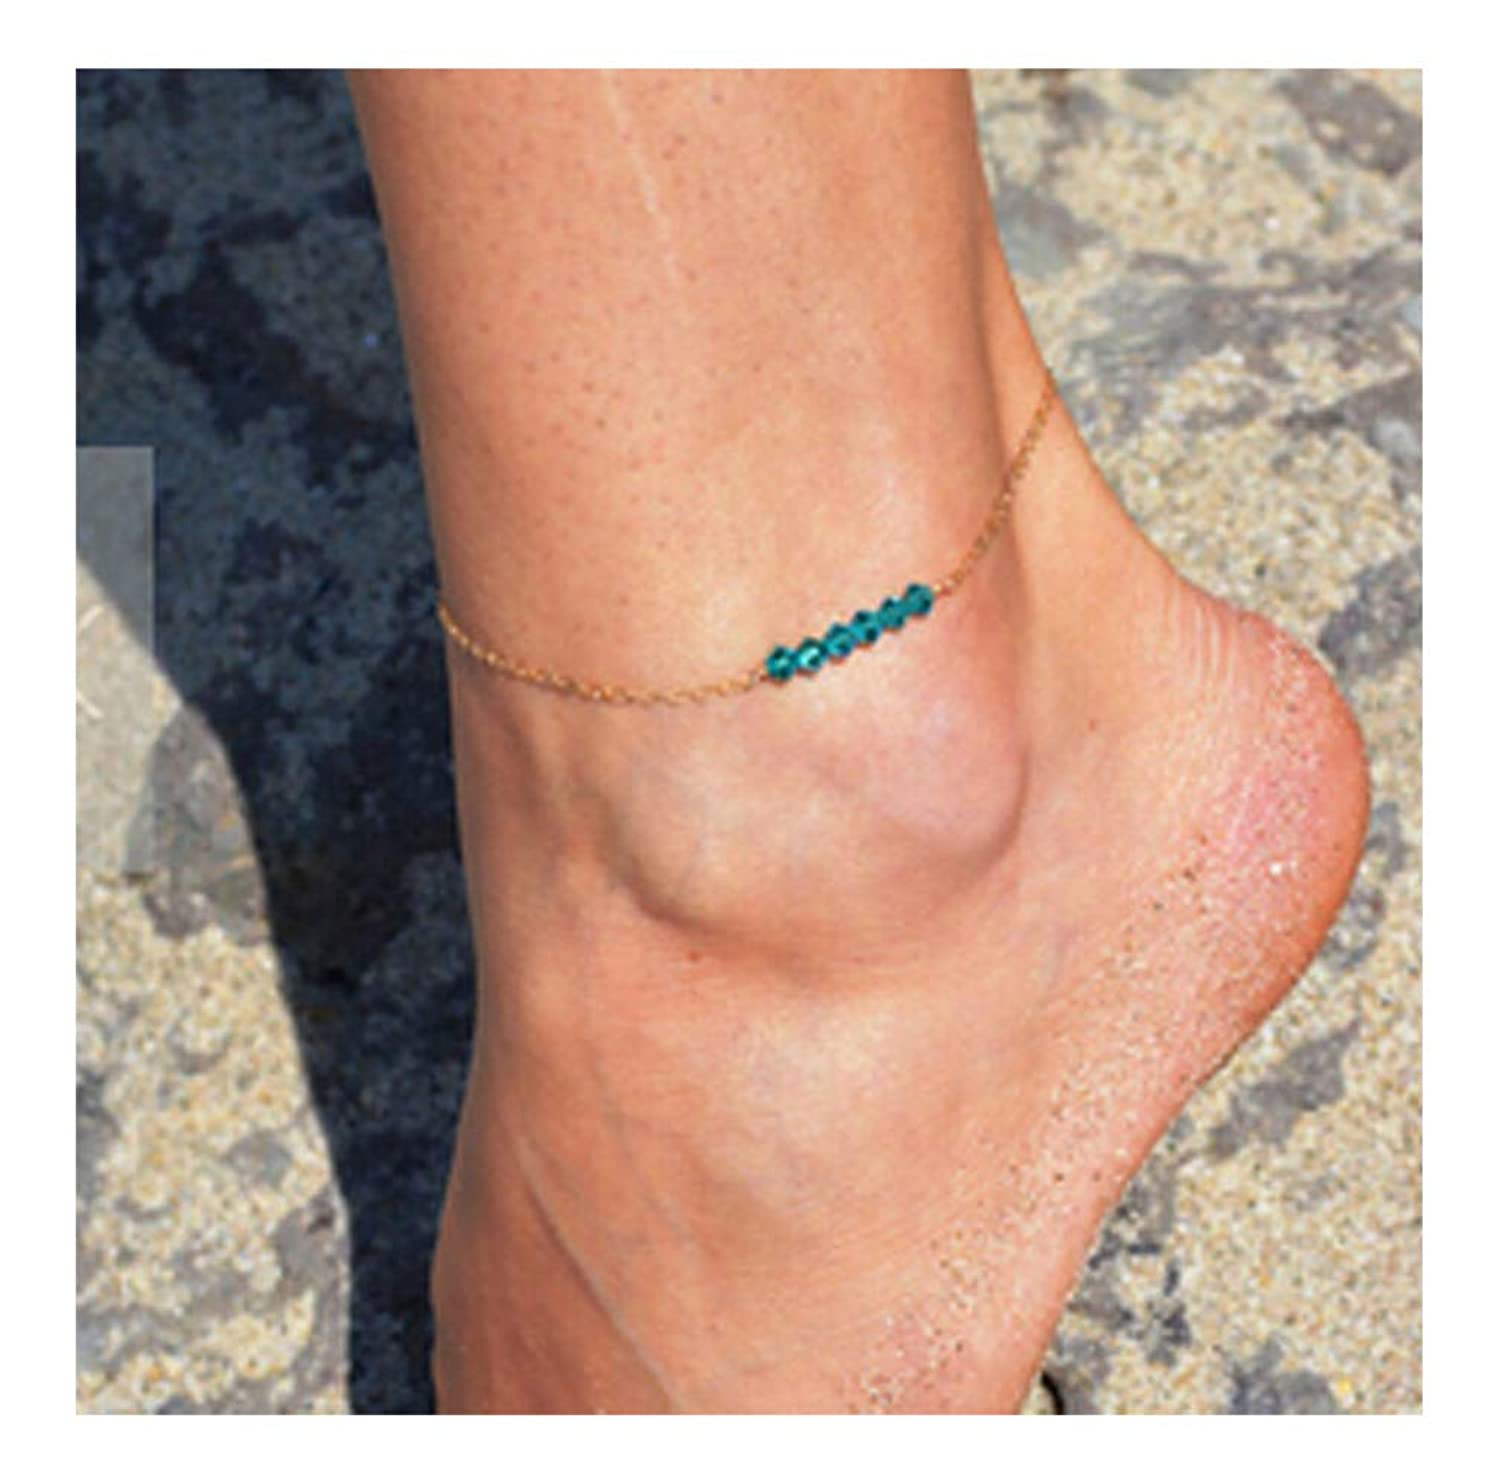 Mooinn Handmade Dainty Anklet Crystal Beads Anklet Beach Foot Chain Ankle Bracelet for Women Girls Anklets Jewelry